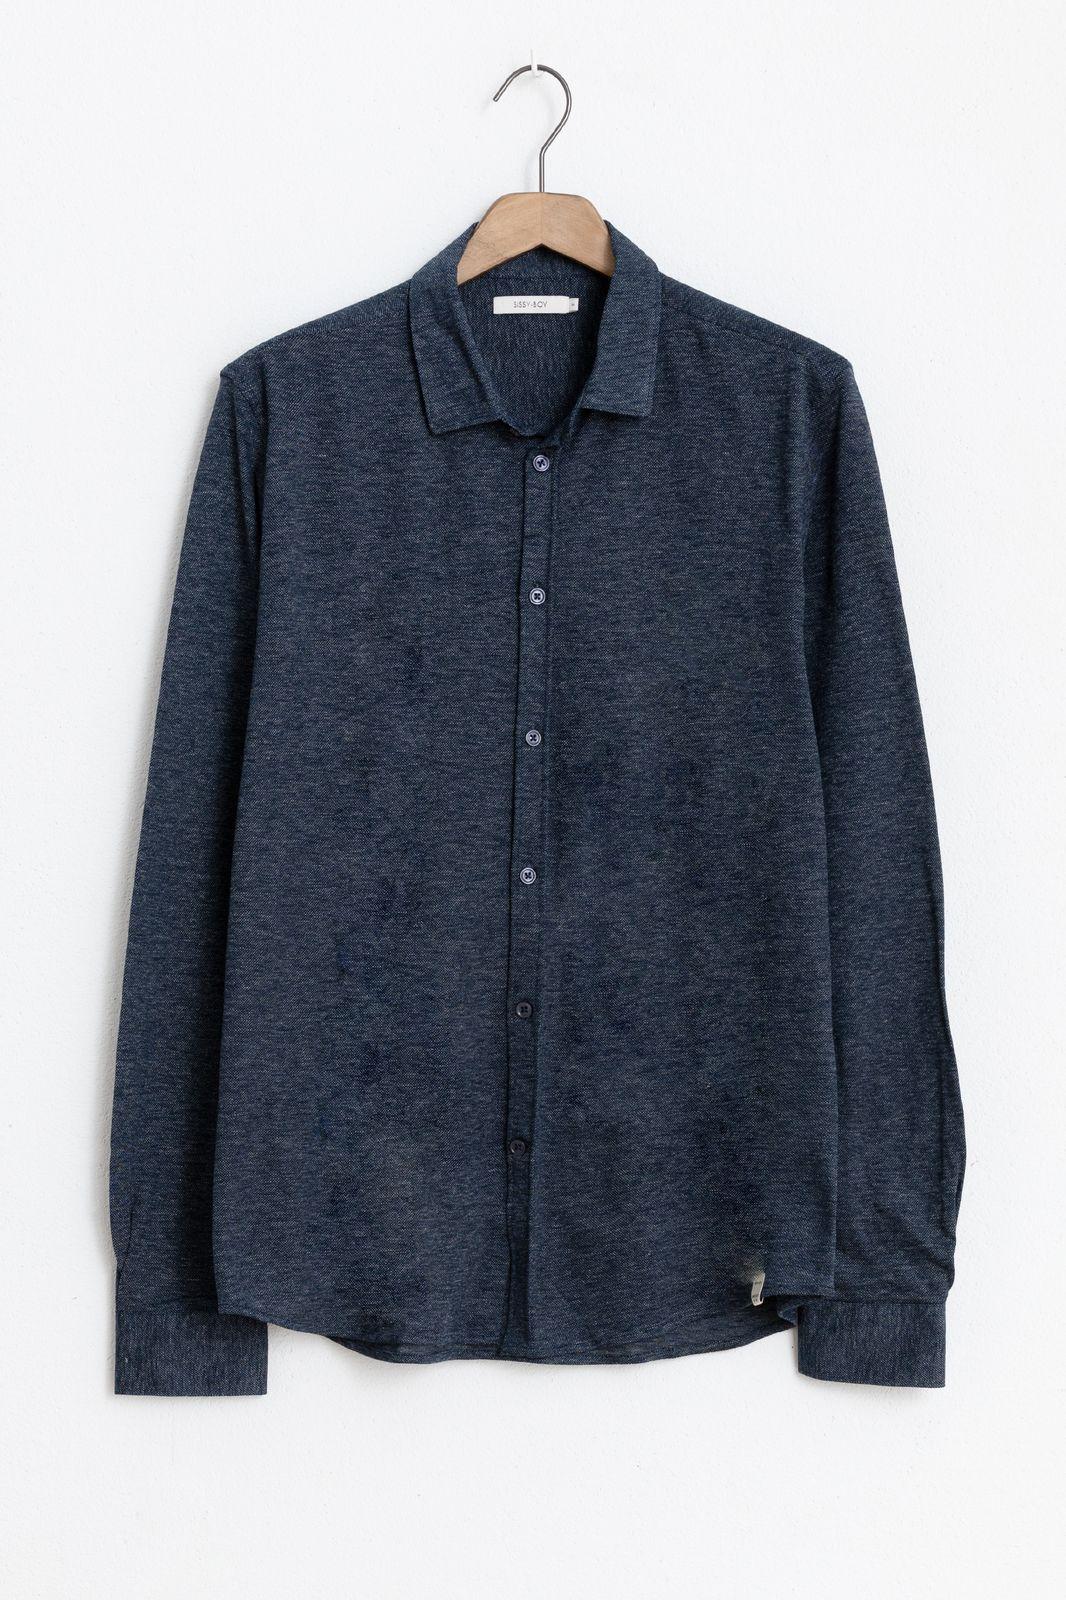 Blauw jersey overhemd - Heren | Sissy-Boy